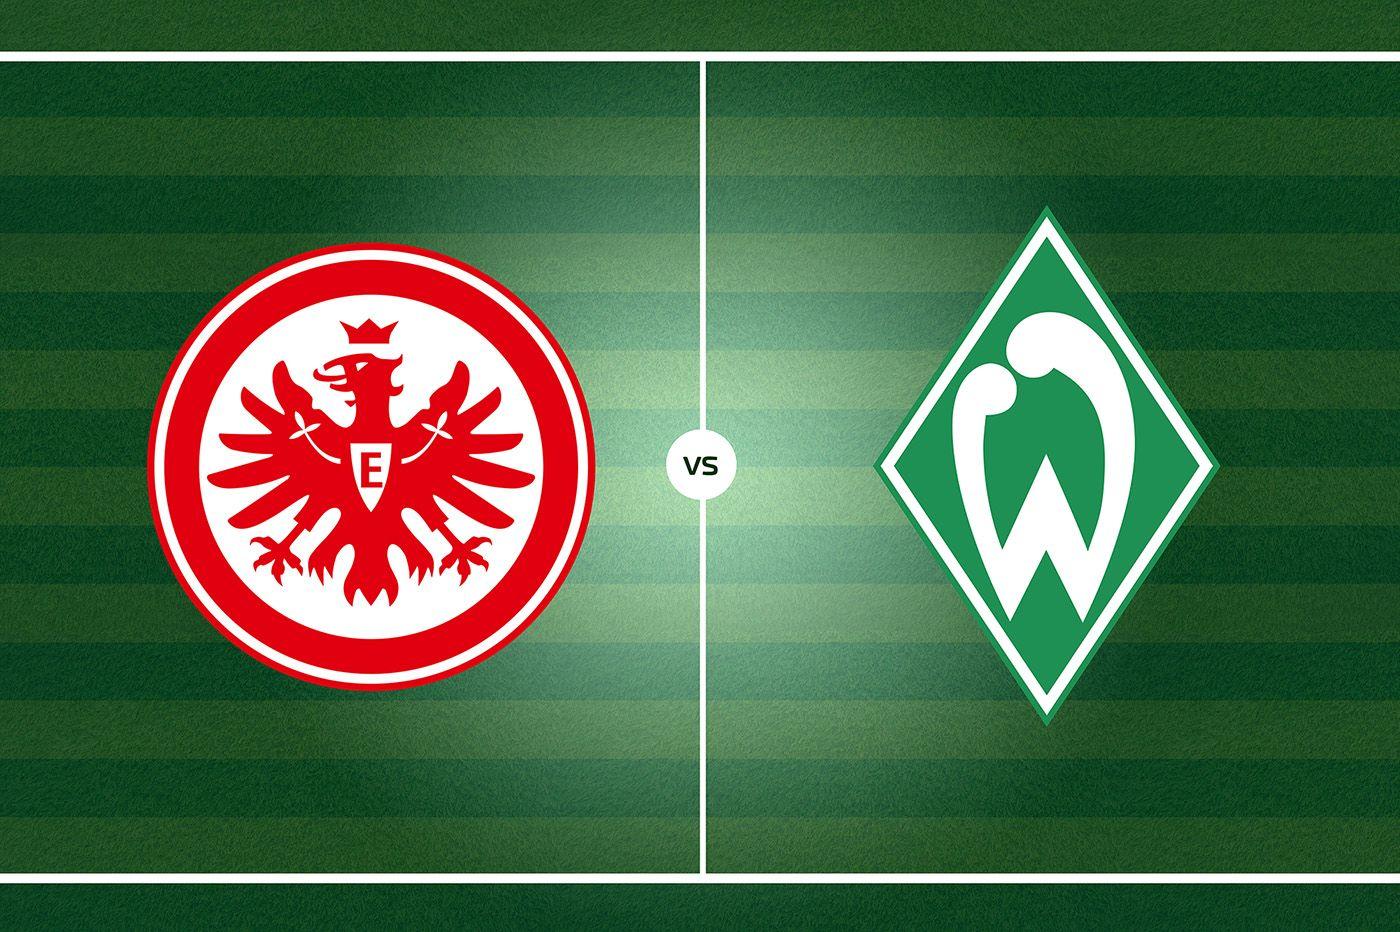 Eintracht Frankfurt Vs Werder Bremen Germany Dfb Pokal March 04 2020 In 2020 Bremen German Cup Borussia Dortmund